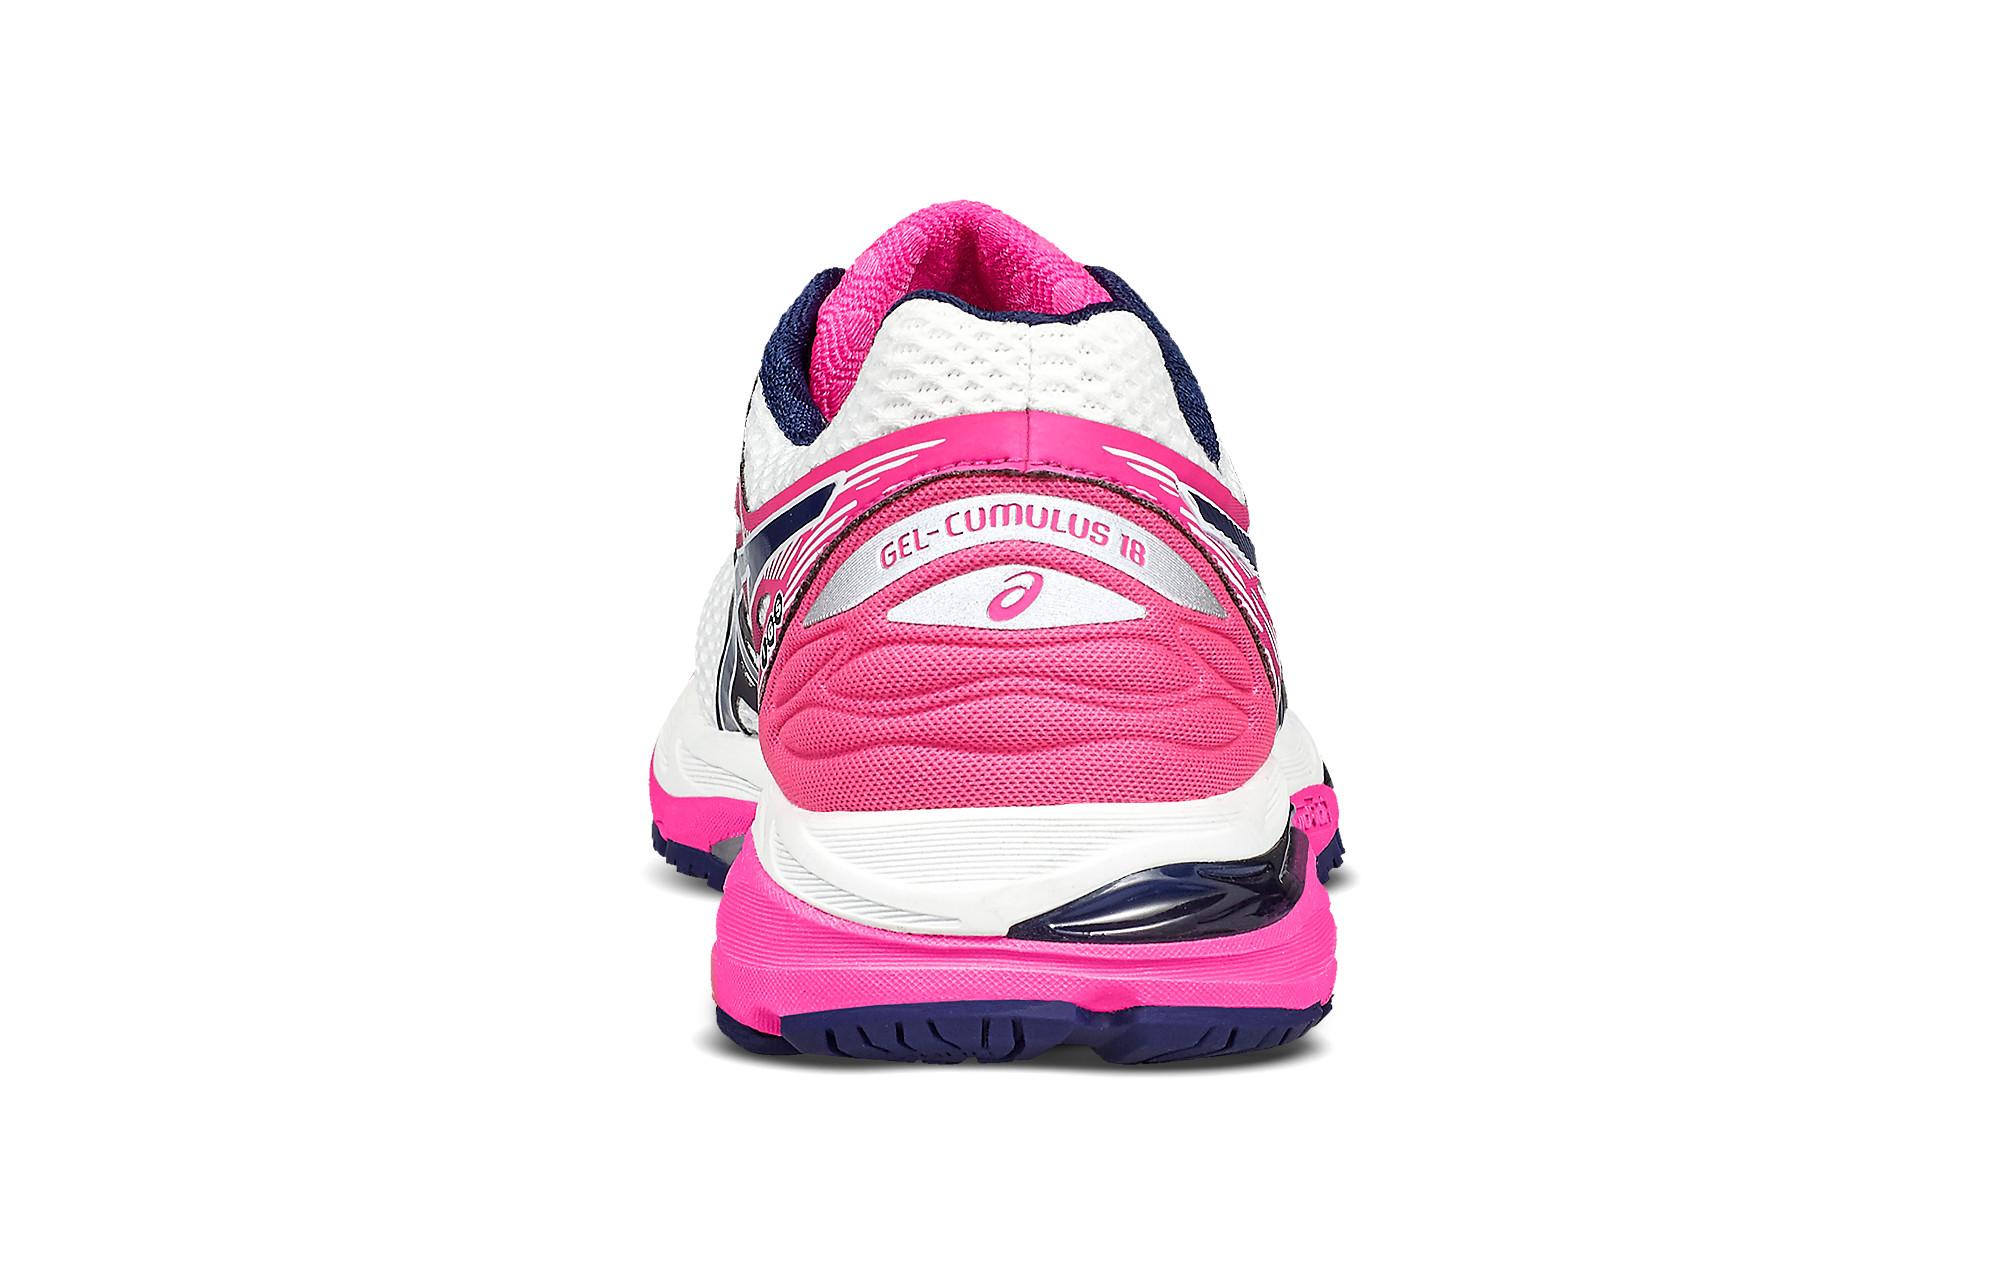 ASICS GEL CUMULUS 18 BLANCHE ET ROSE Chaussures Running femme